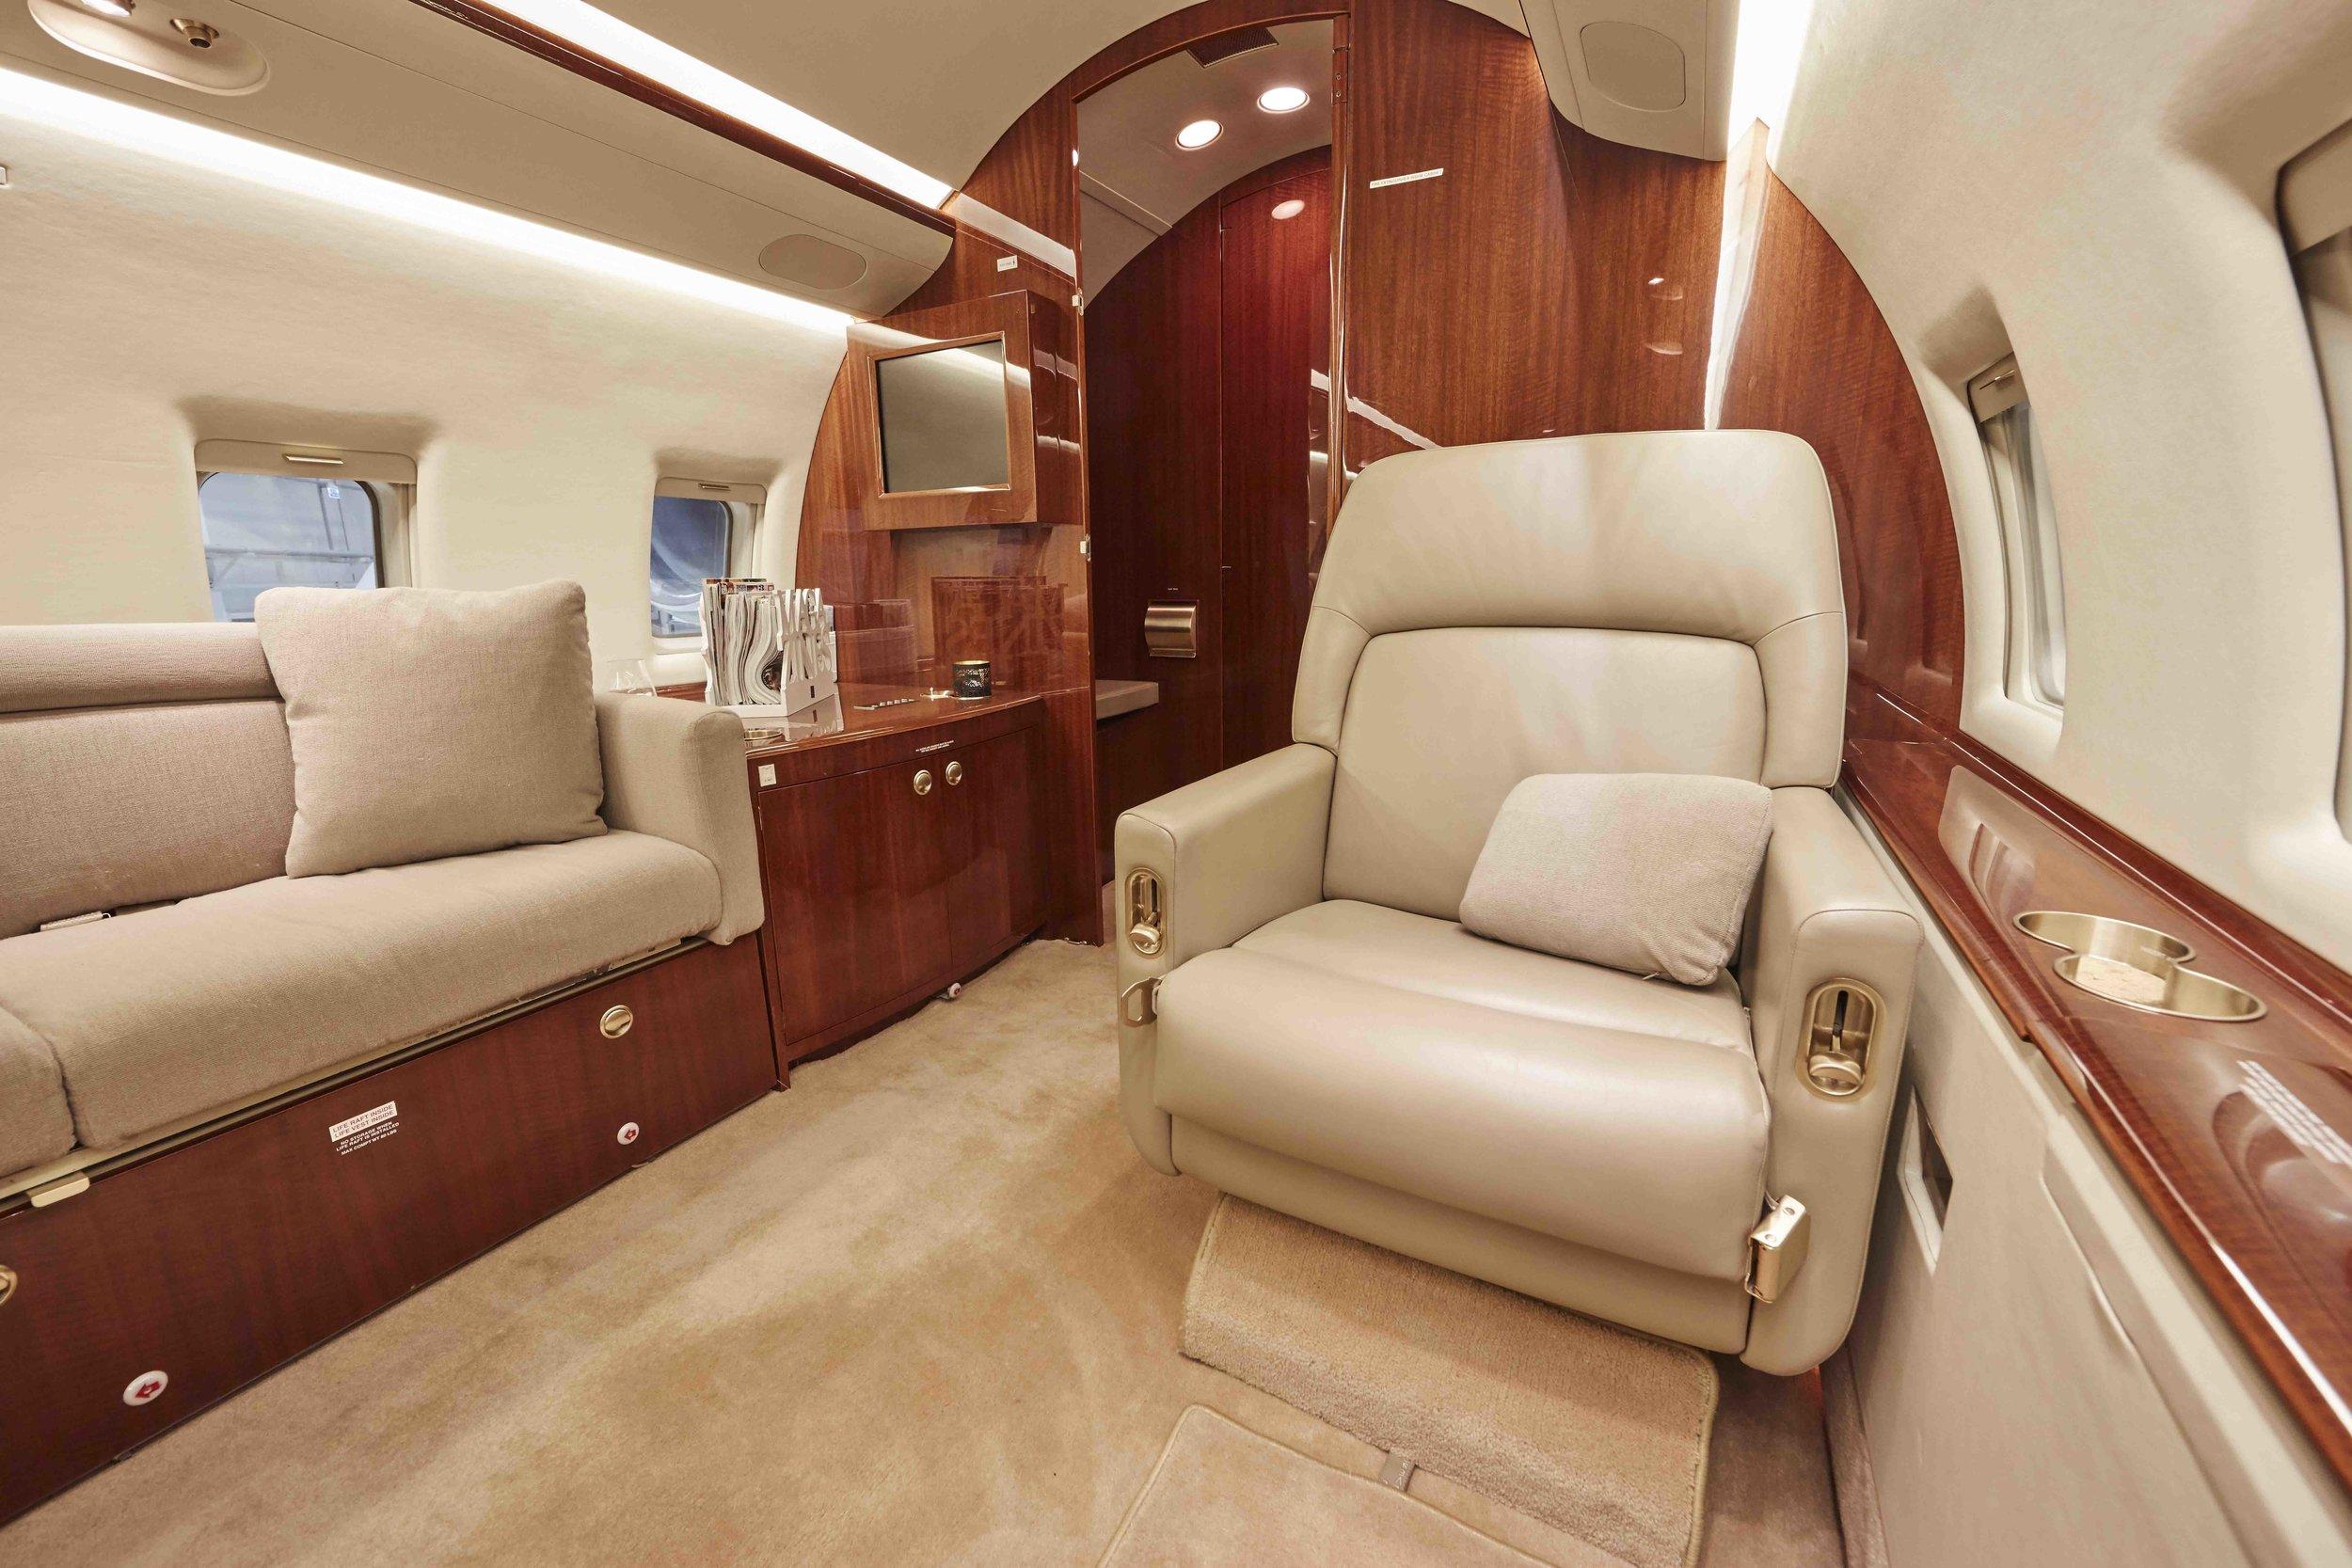 2005 Challenger 604 For Sale Interior 7